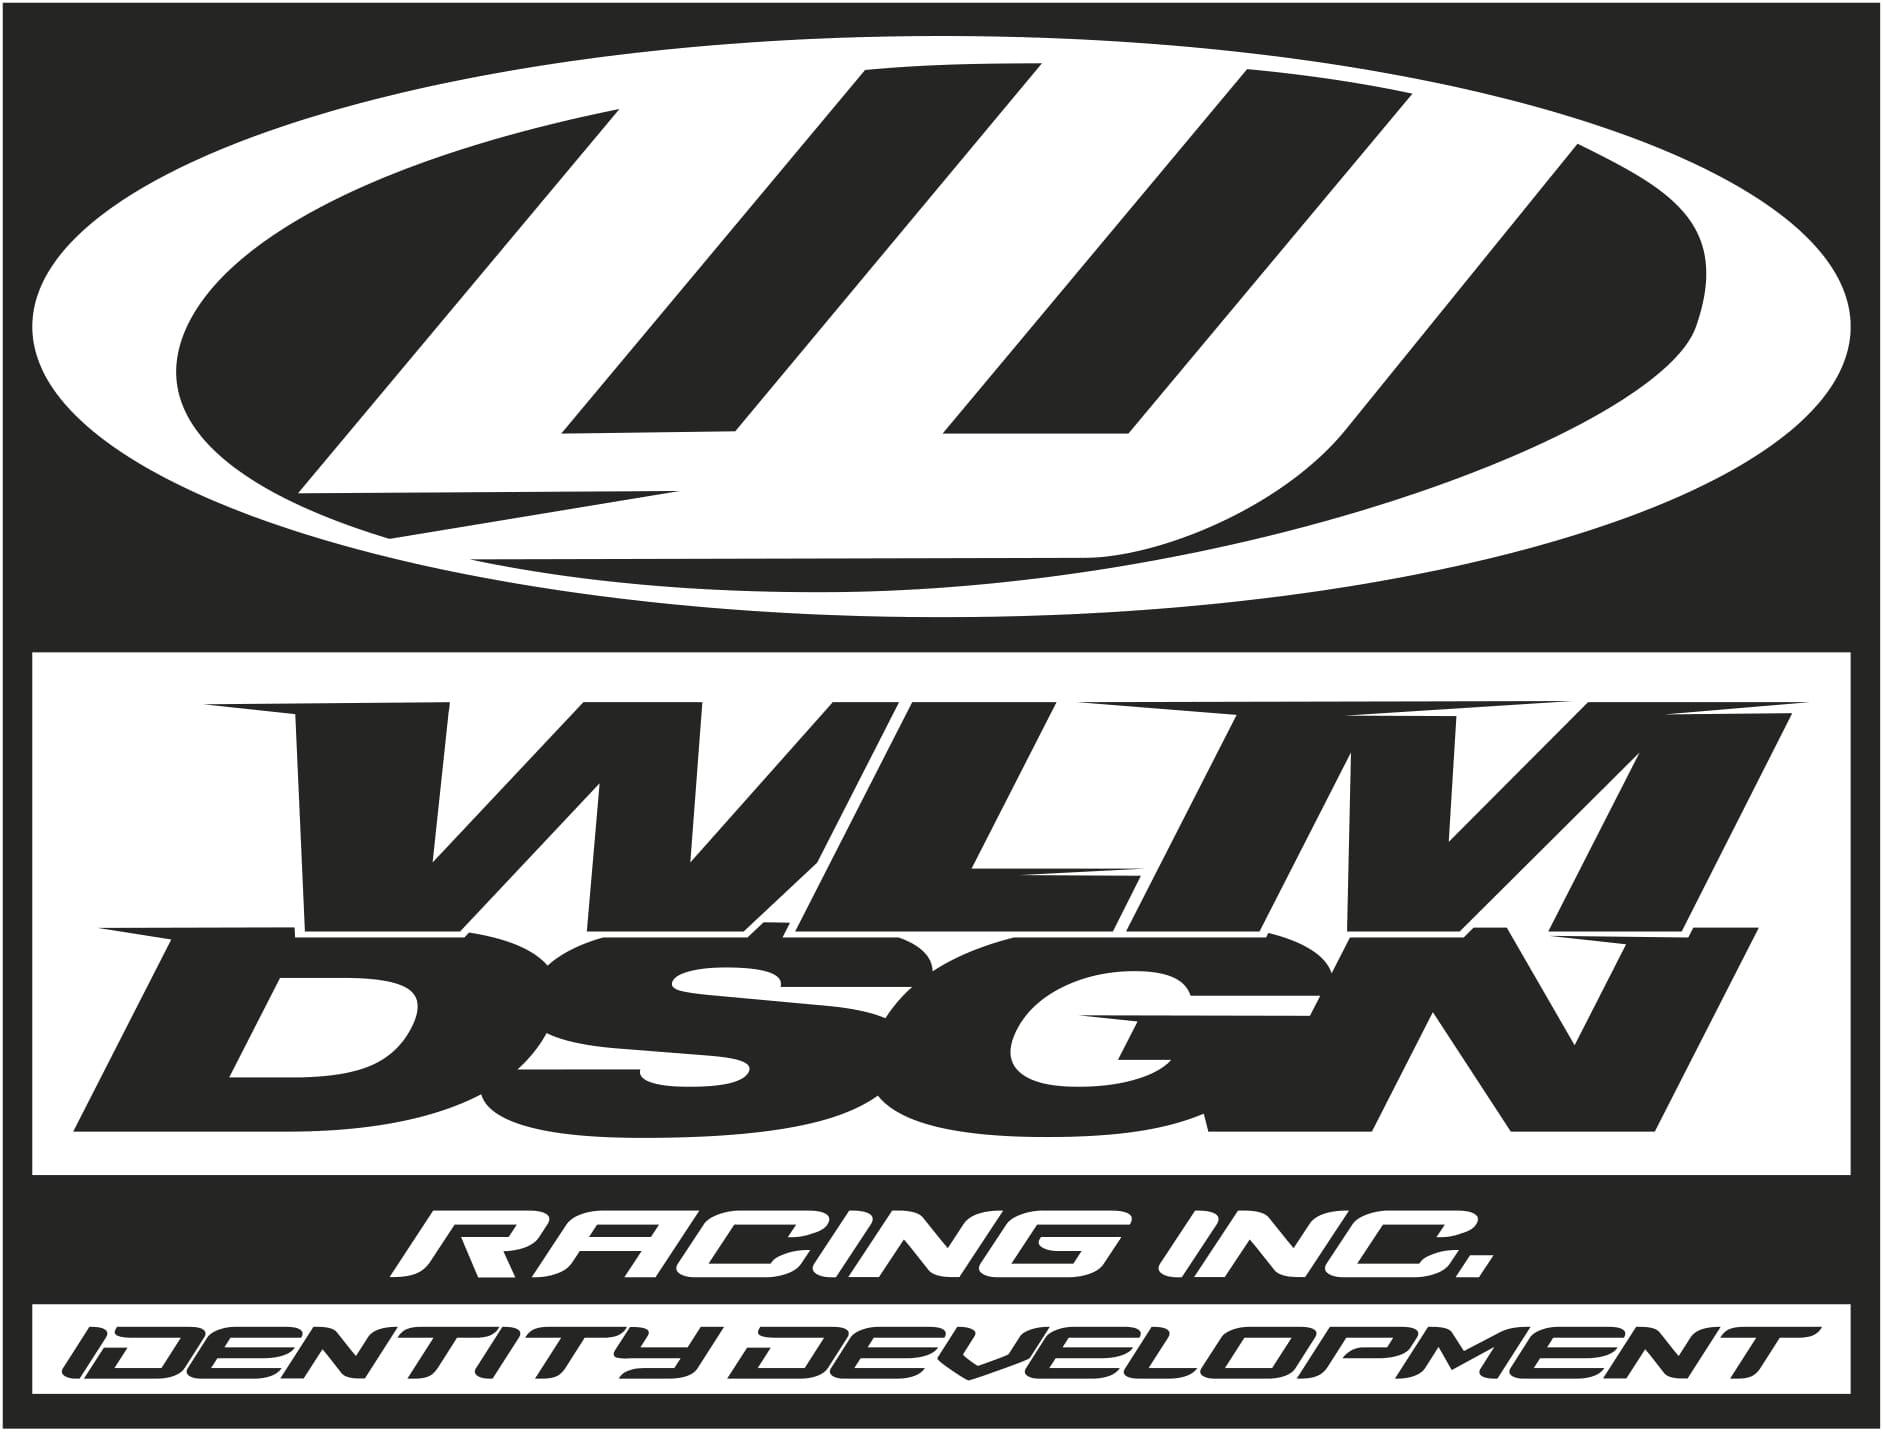 WLM DSGN racing